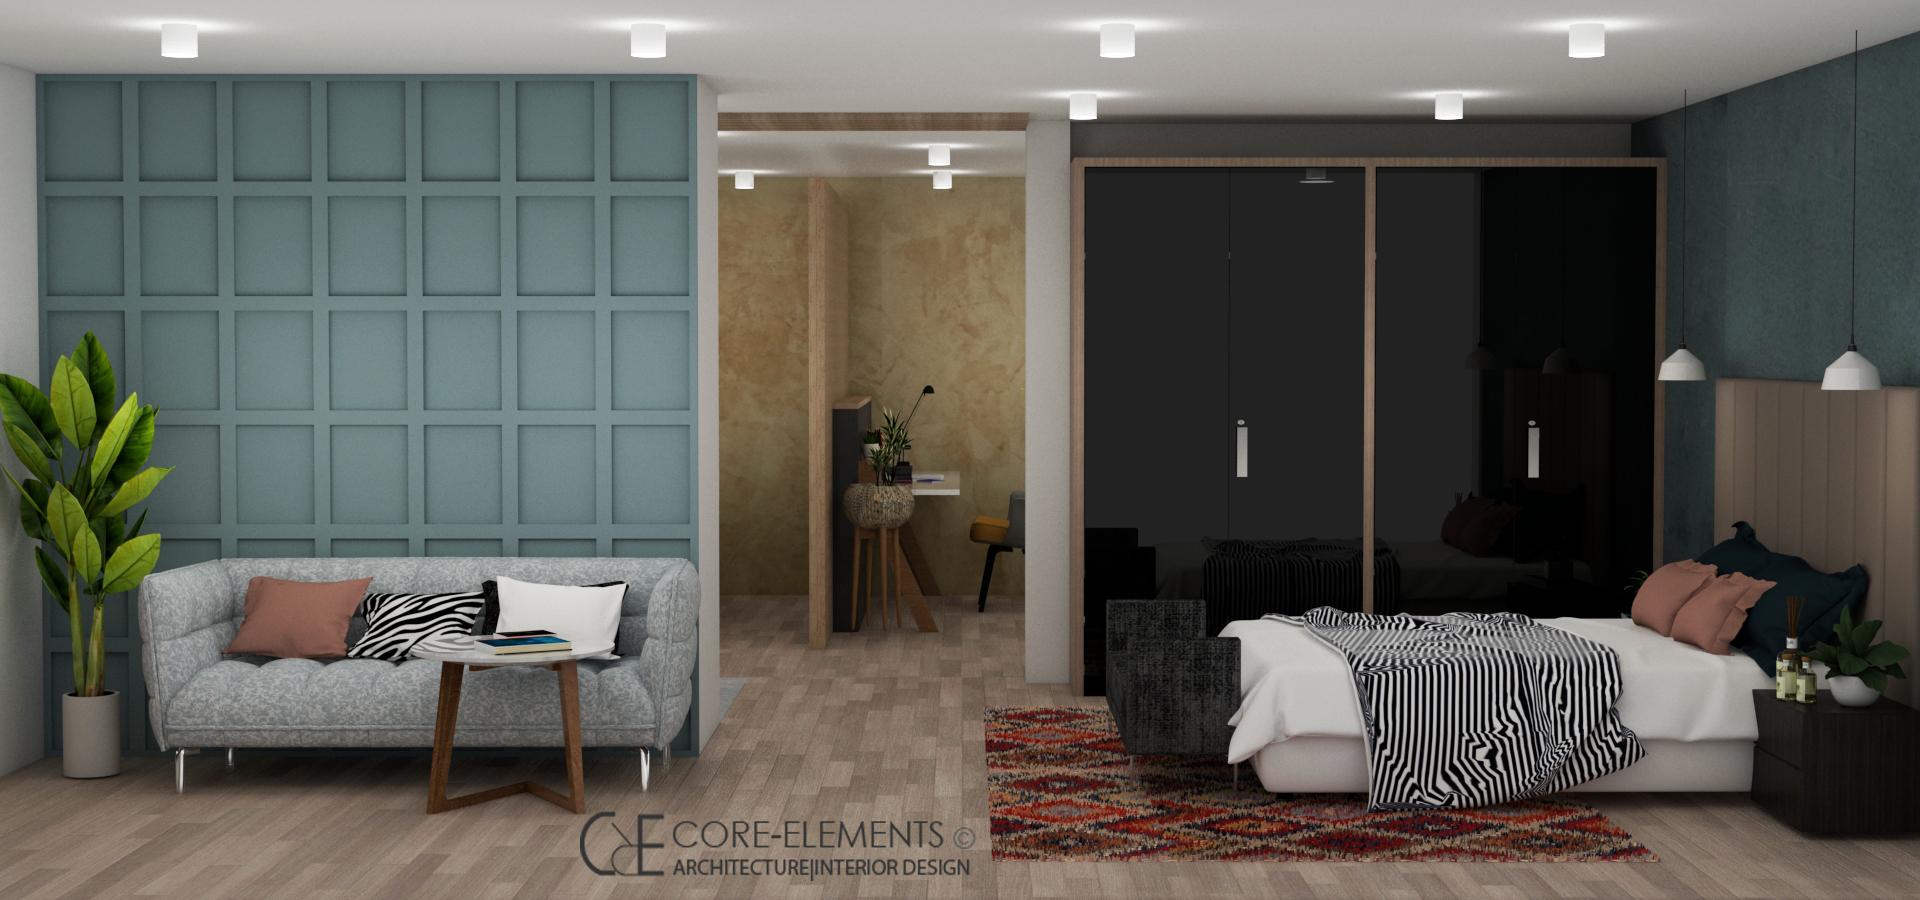 13. Bedroom II